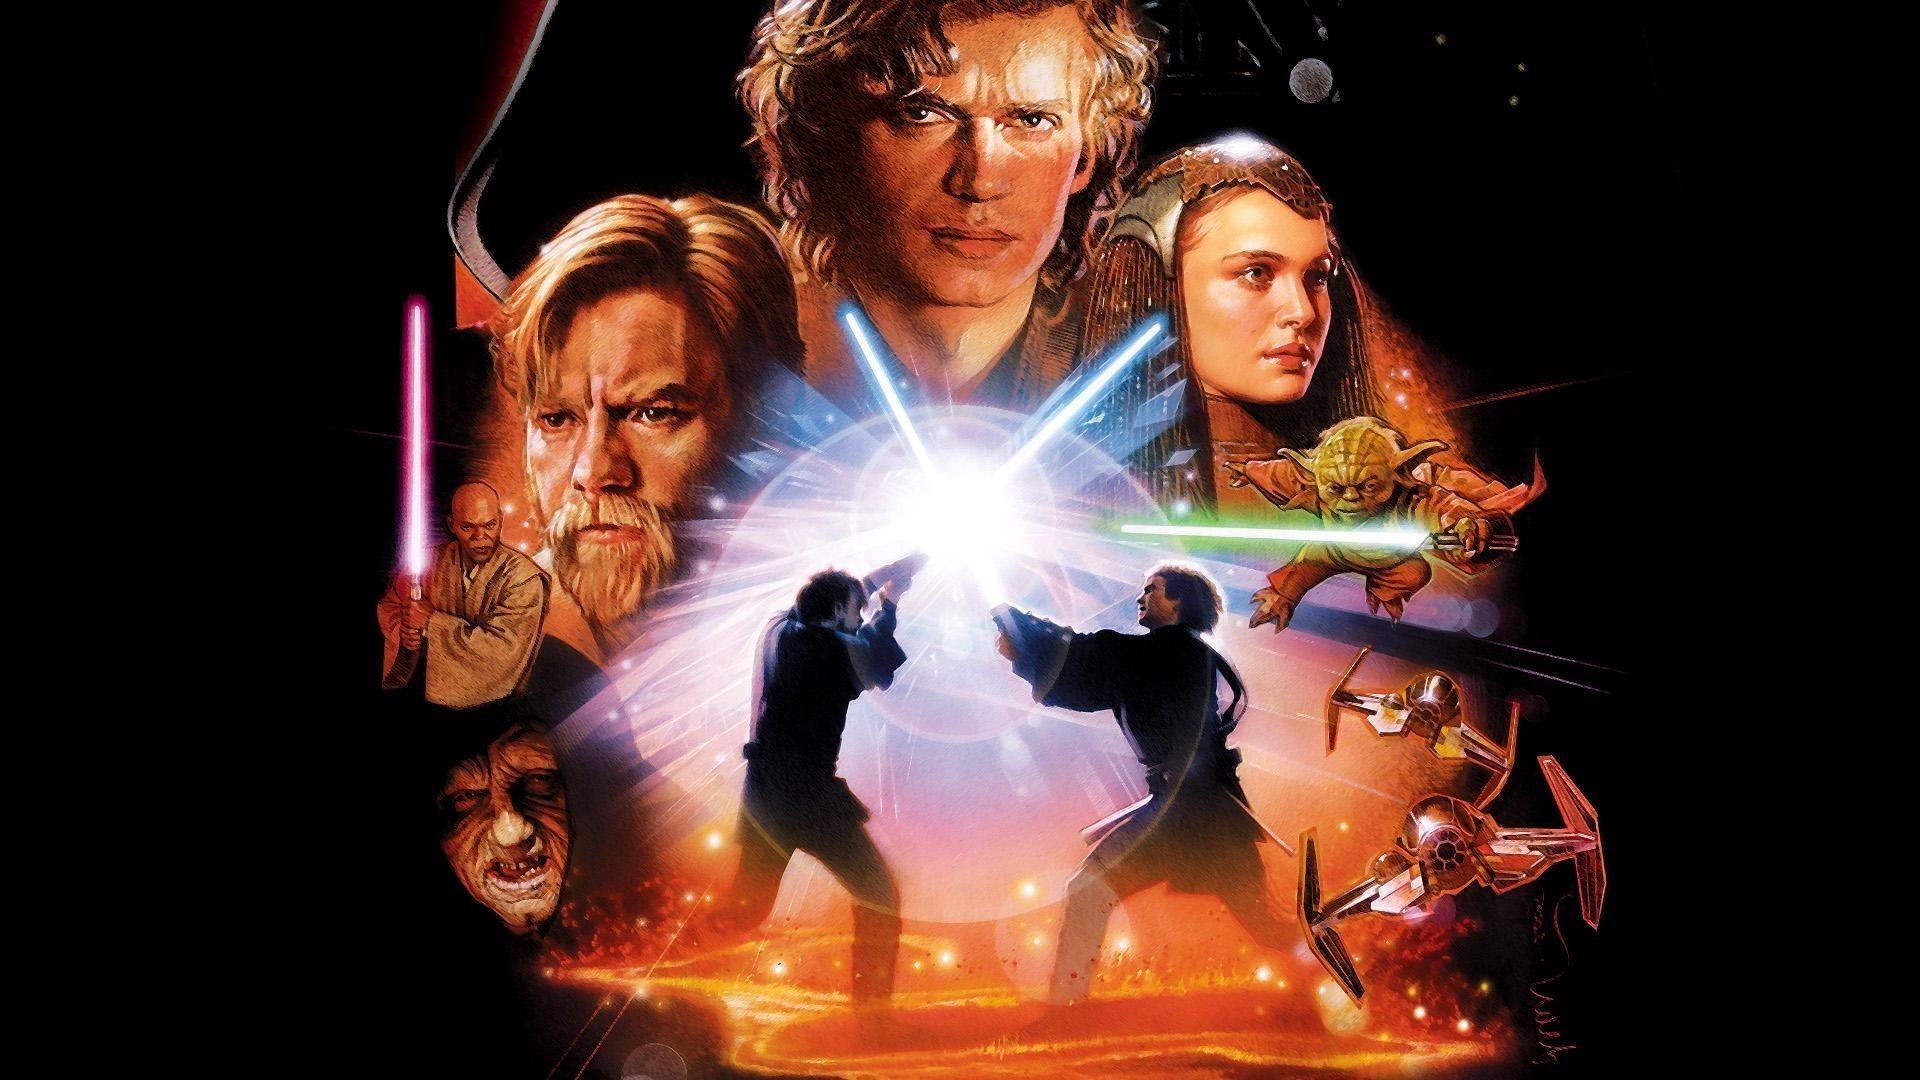 movies, Star Wars, Star Wars: Episode III The Revenge Of The Sith, Anakin  Skywalker, Padme Amidala, Obi Wan Kenobi Wallpapers HD / Desktop and Mobile  …